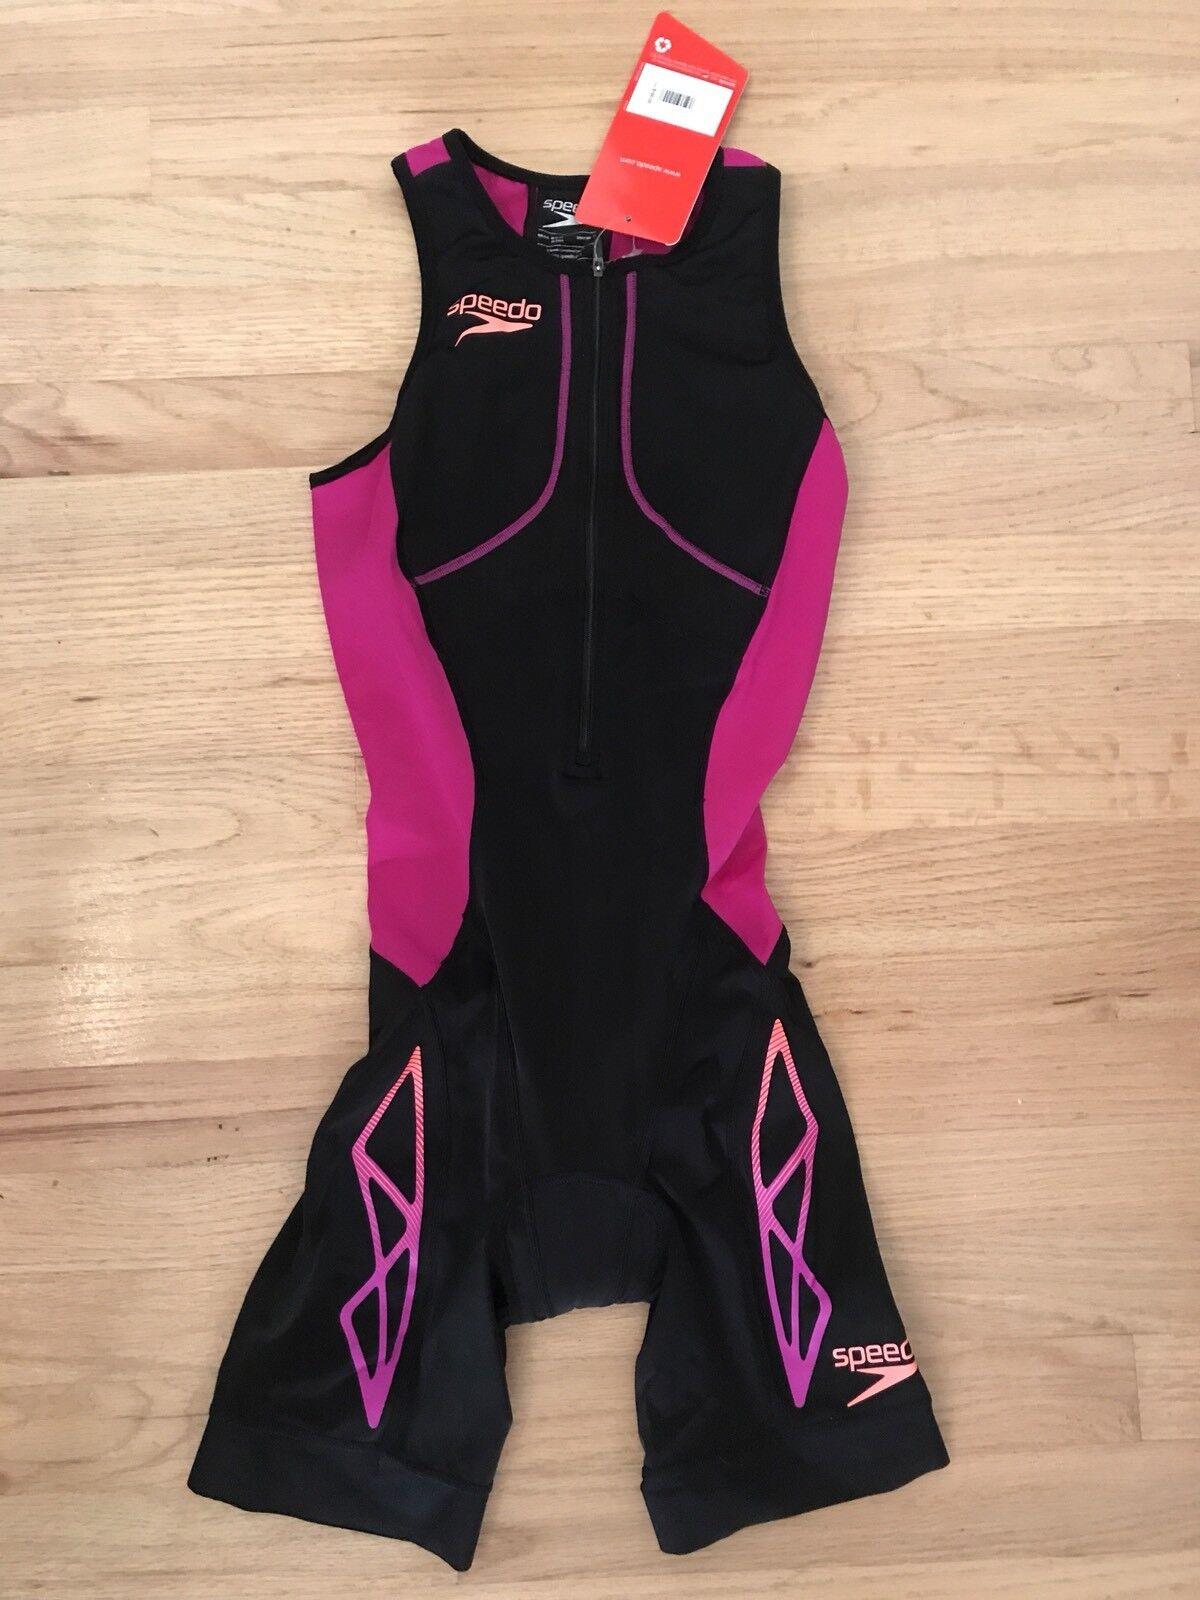 Women's Speedo Xenon Triwear Race Suit size Medium Brand NewTags on  FREE ship